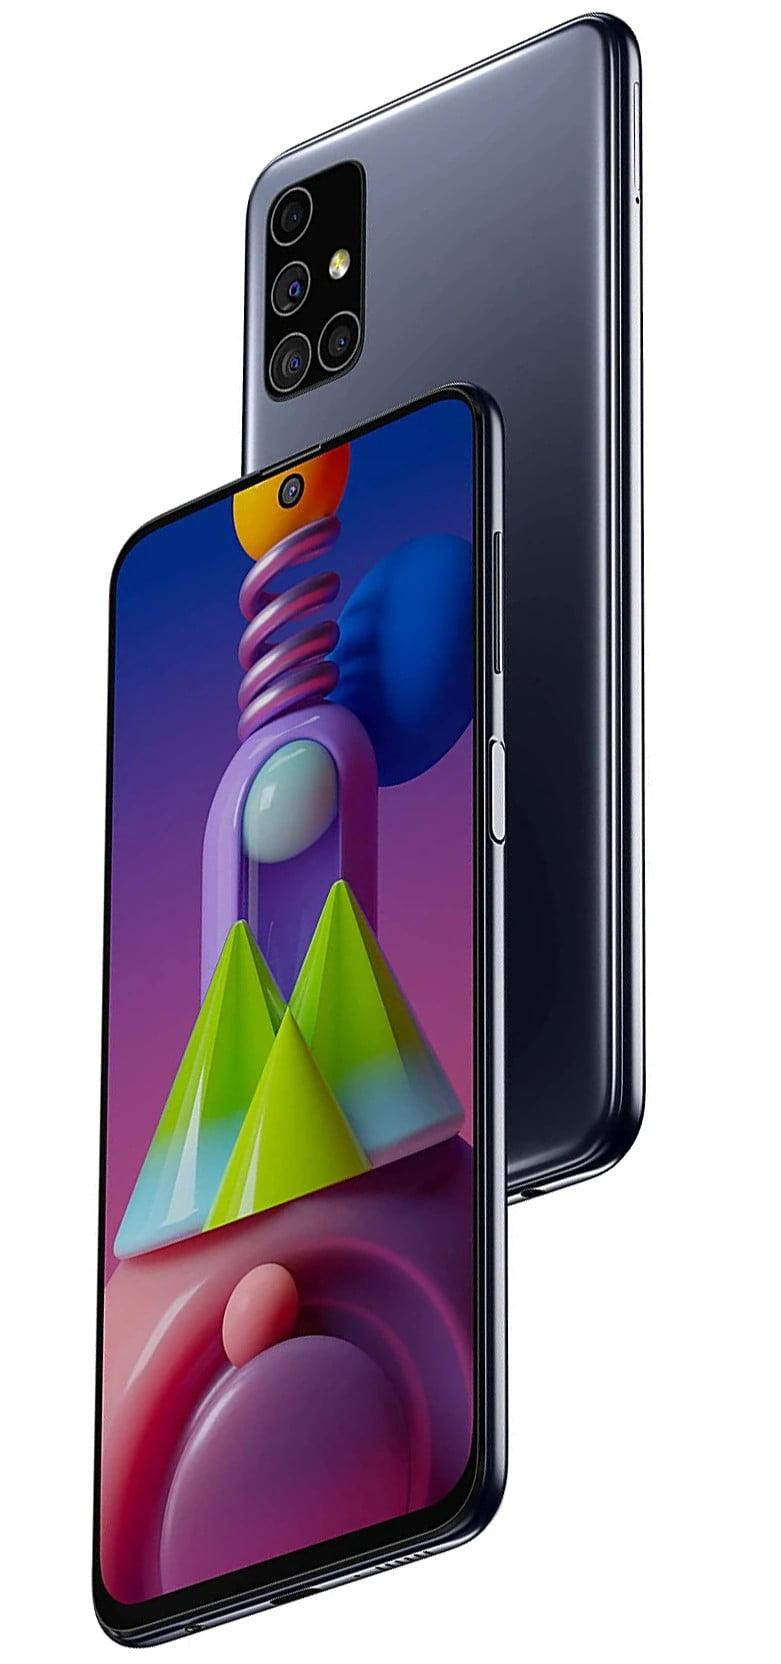 order samsung m51 smartphone from daraz.com.bd